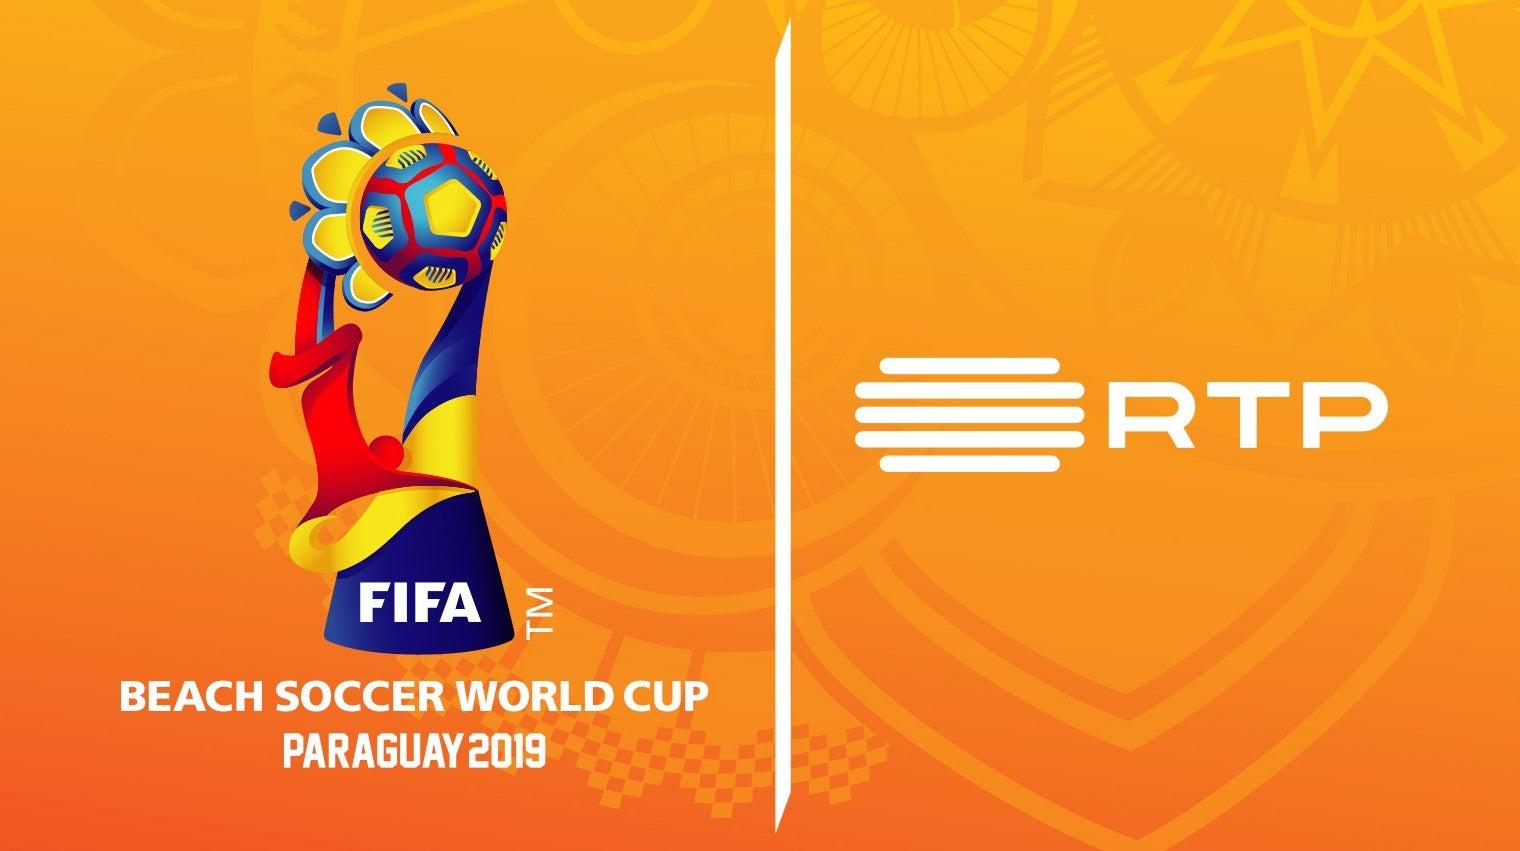 FIFA Campeonato do Mundo de Futebol de Praia